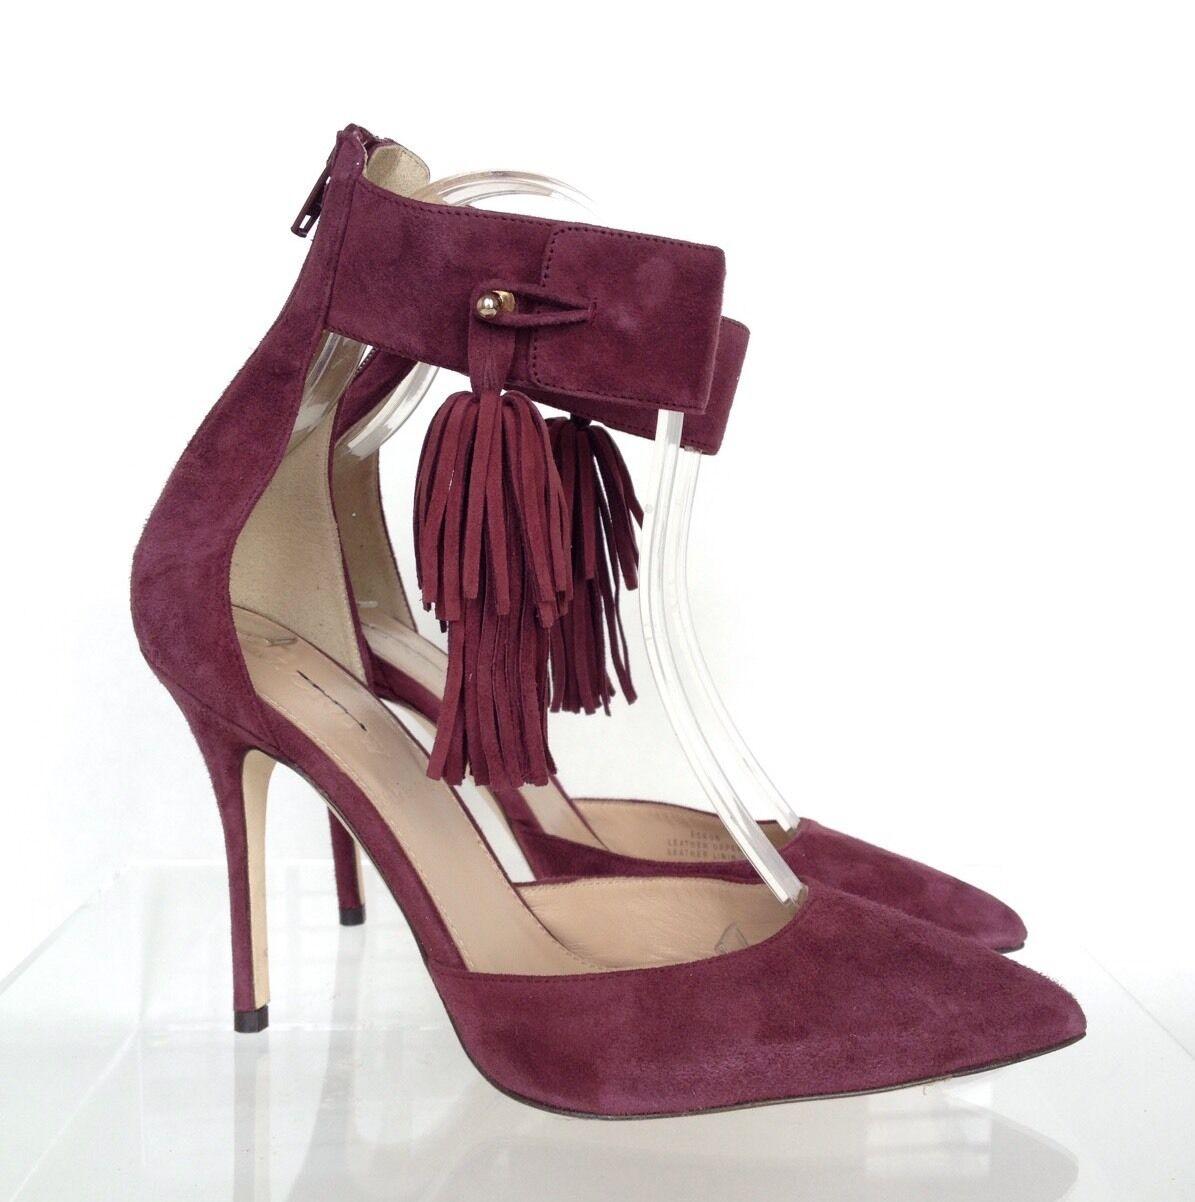 J.CREW Roxie Ankle-Cuff Tassel Suede Pumps Sz 6 ROT Cabernet e0806 315